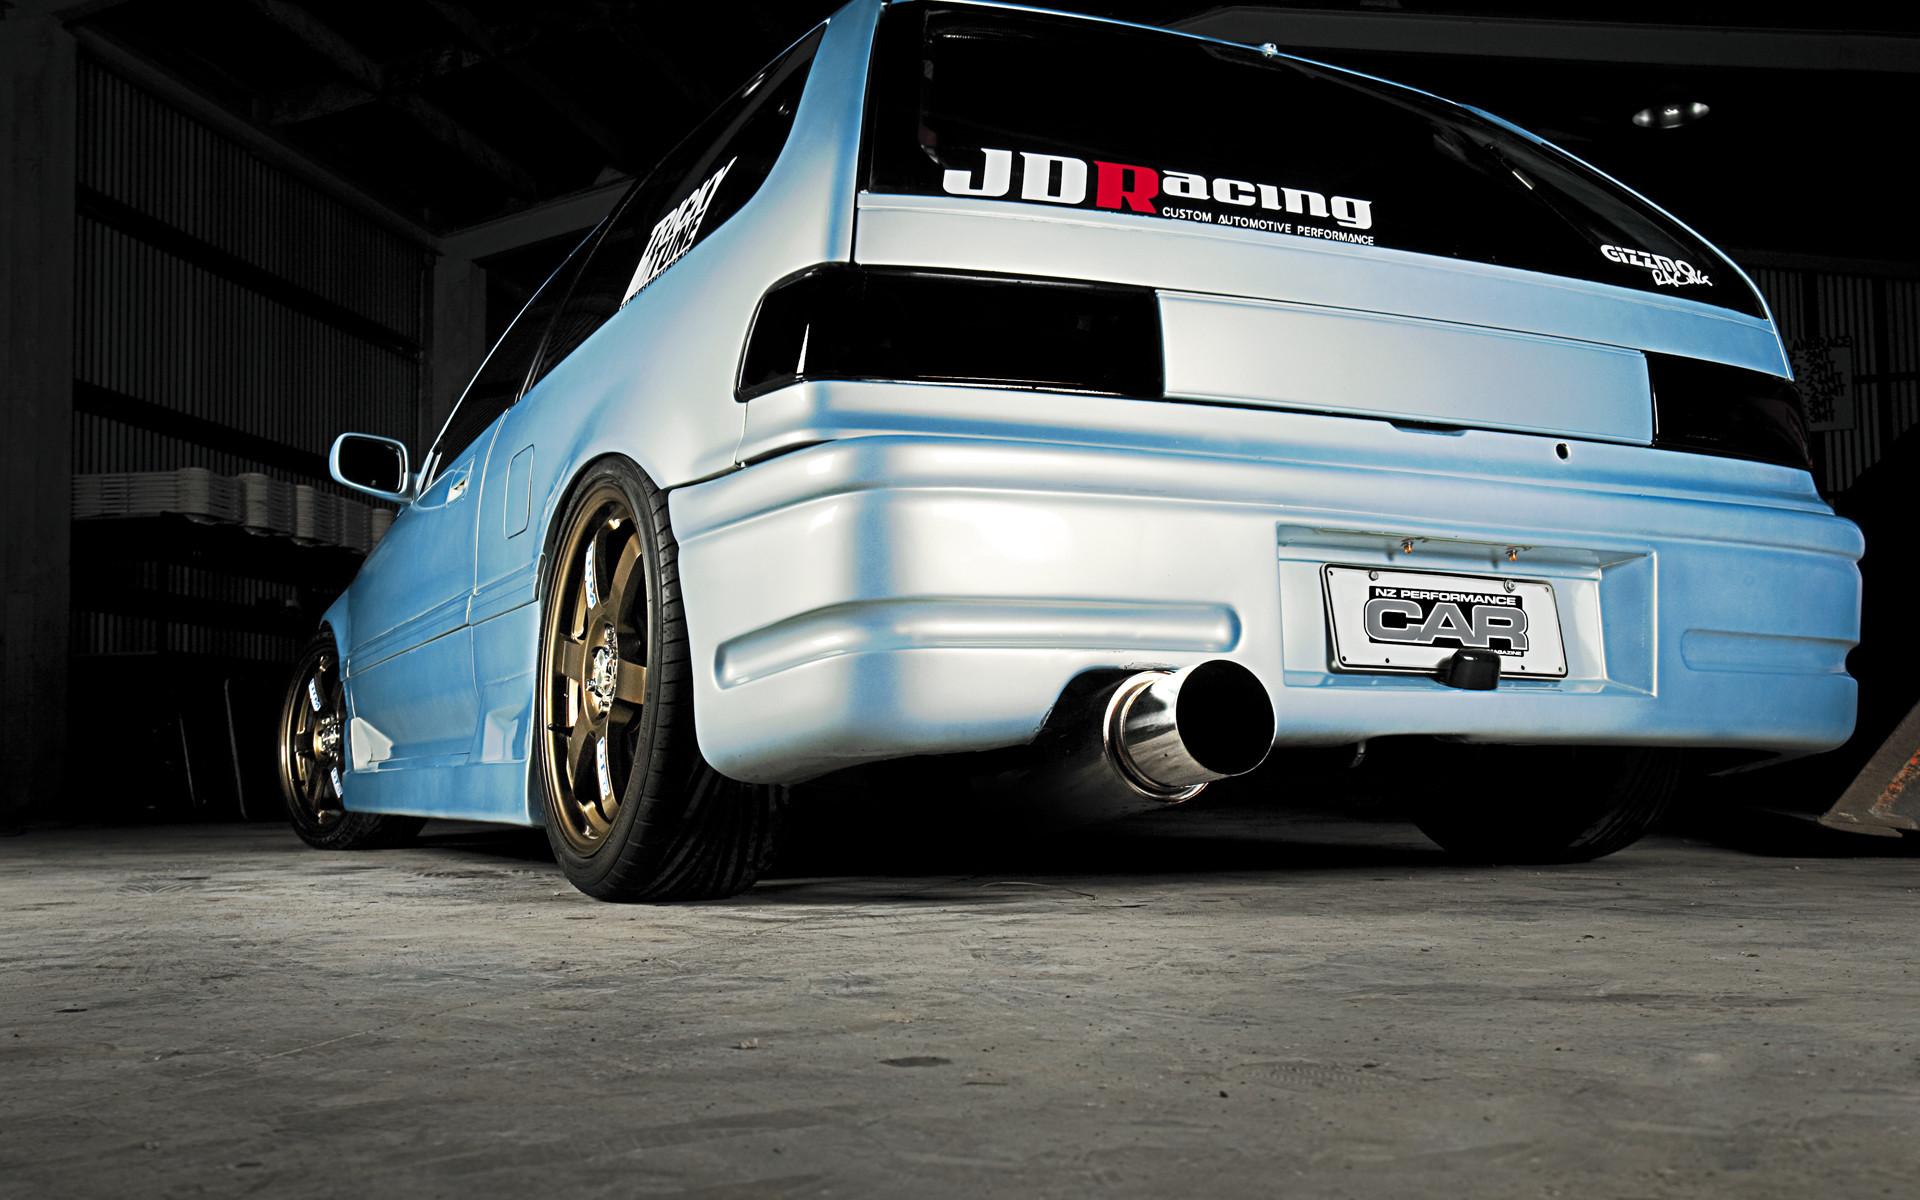 Vertical Honda Crx Wallpaper X P on 1991 Honda Crx